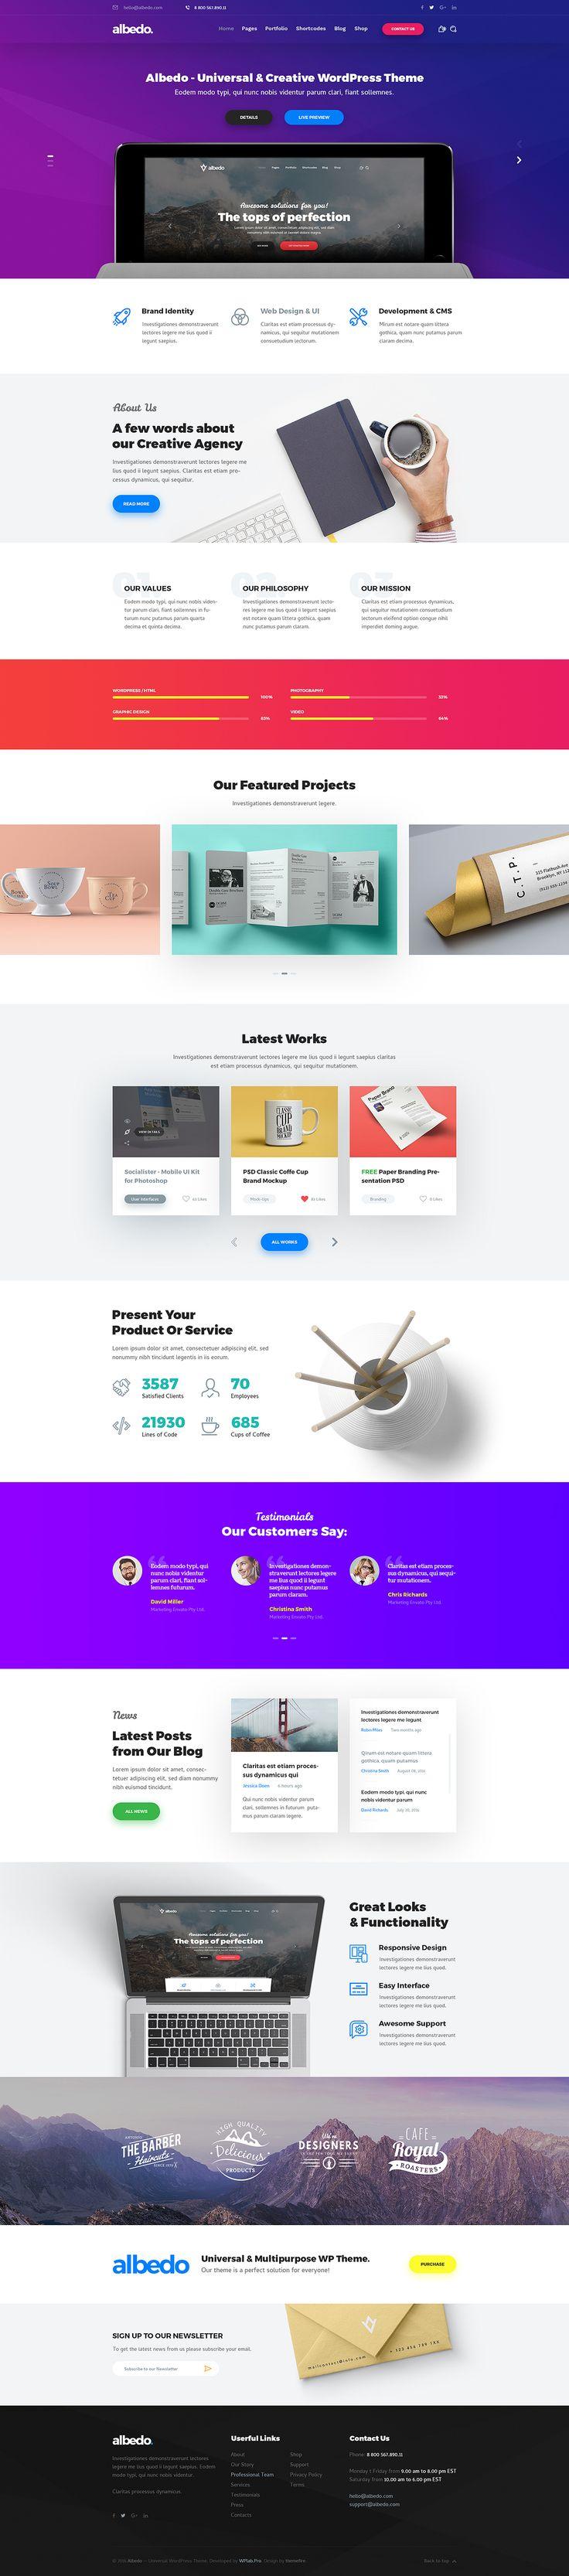 Albedo - Creative Agency PSD Template by themefire | ThemeForest